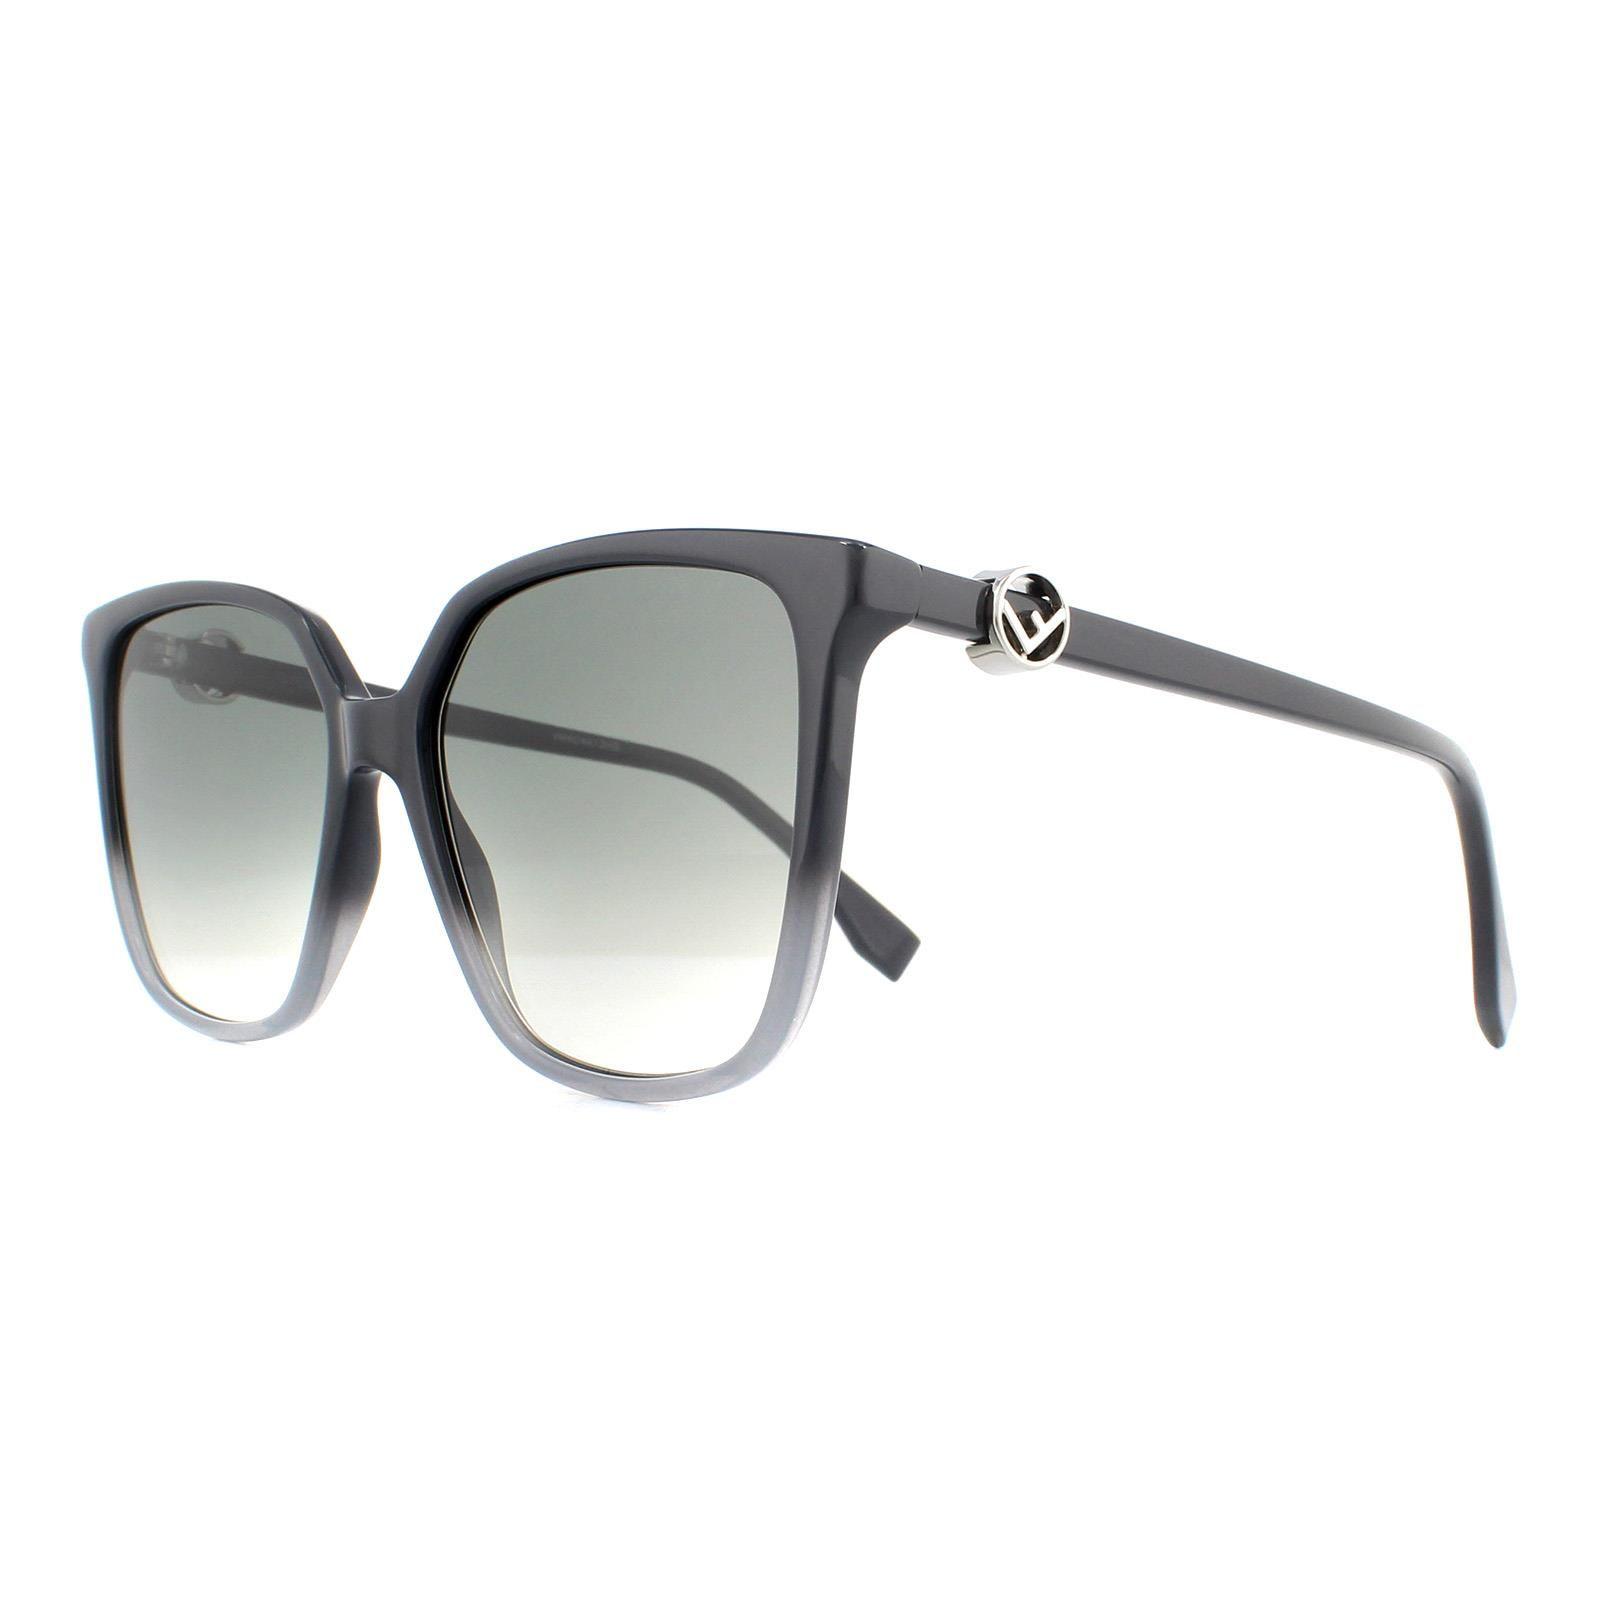 Fendi Sunglasses FF 0318/S KB7 9O Grey Gradient Grey Gradient